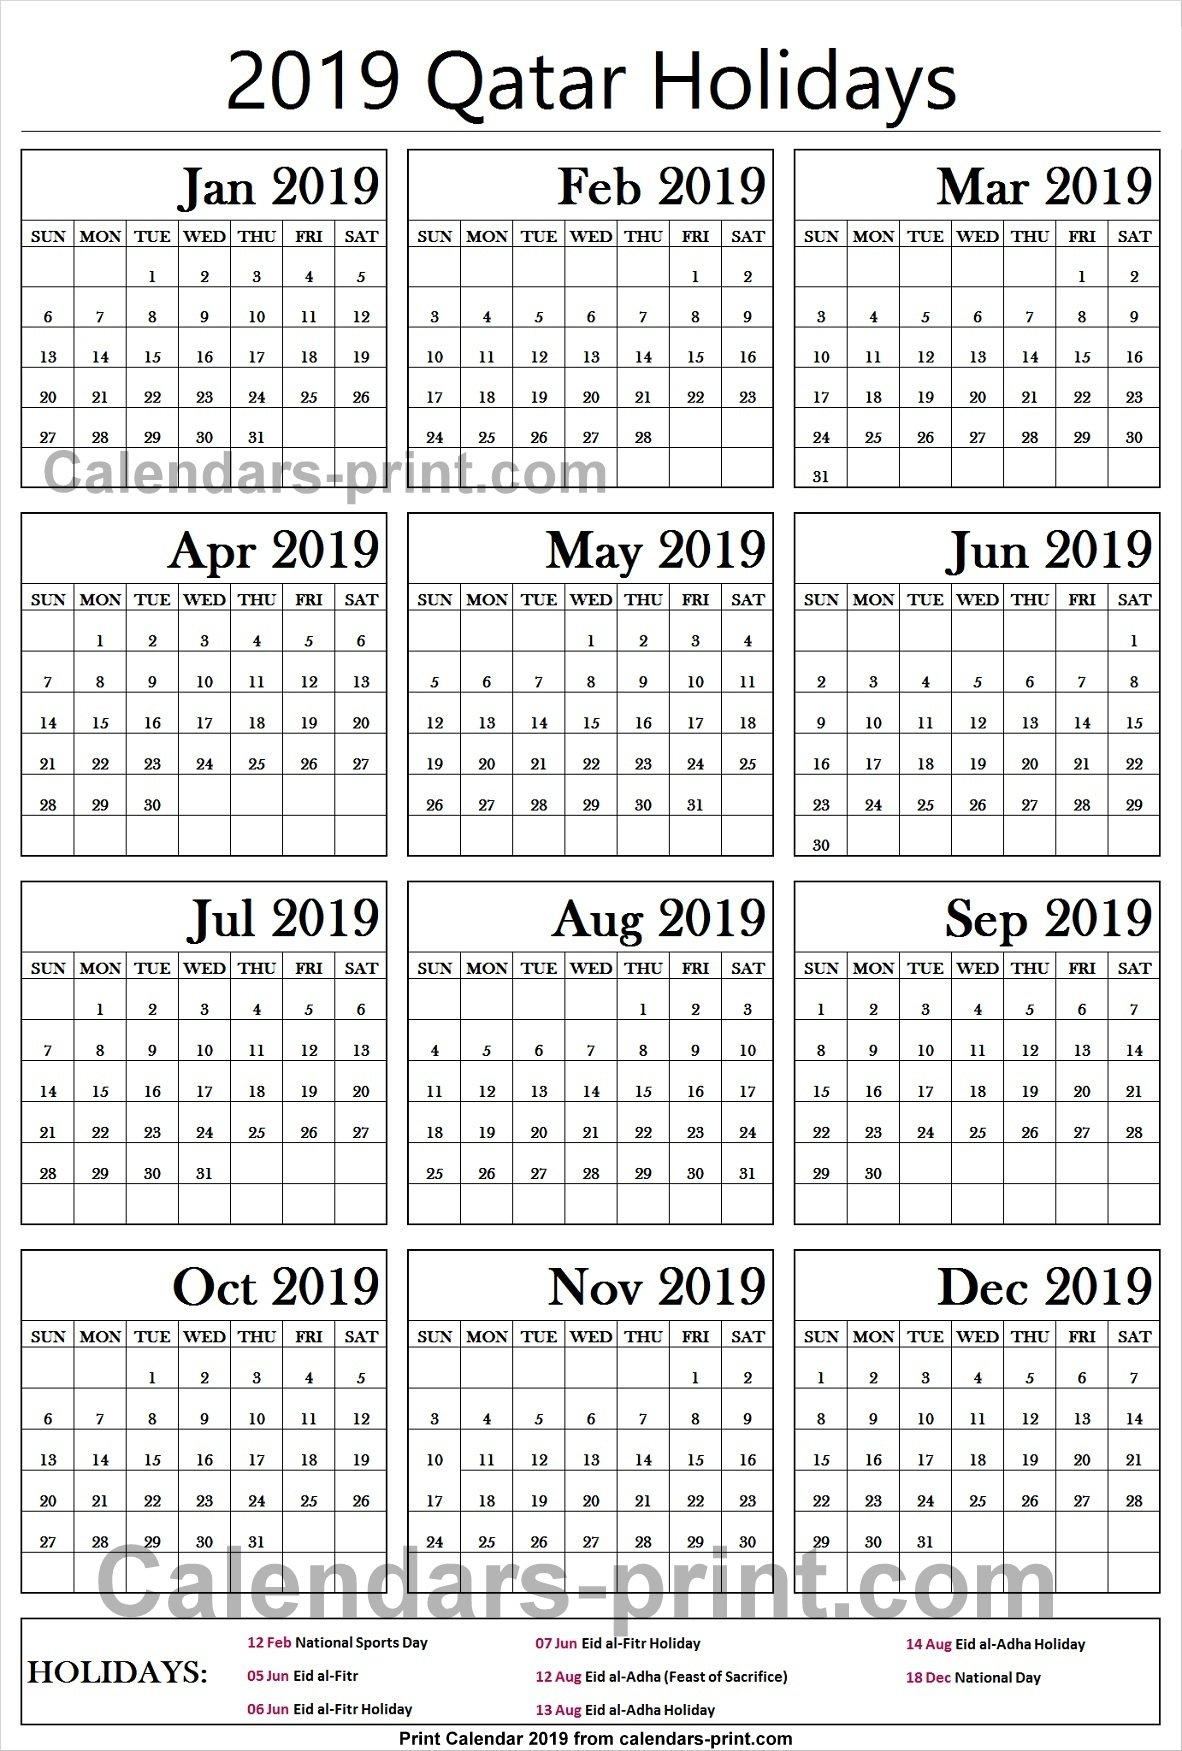 2019 Calendar With Holidays Qatar Printable | 2019 Calendar Template Calendar 2019 Qatar